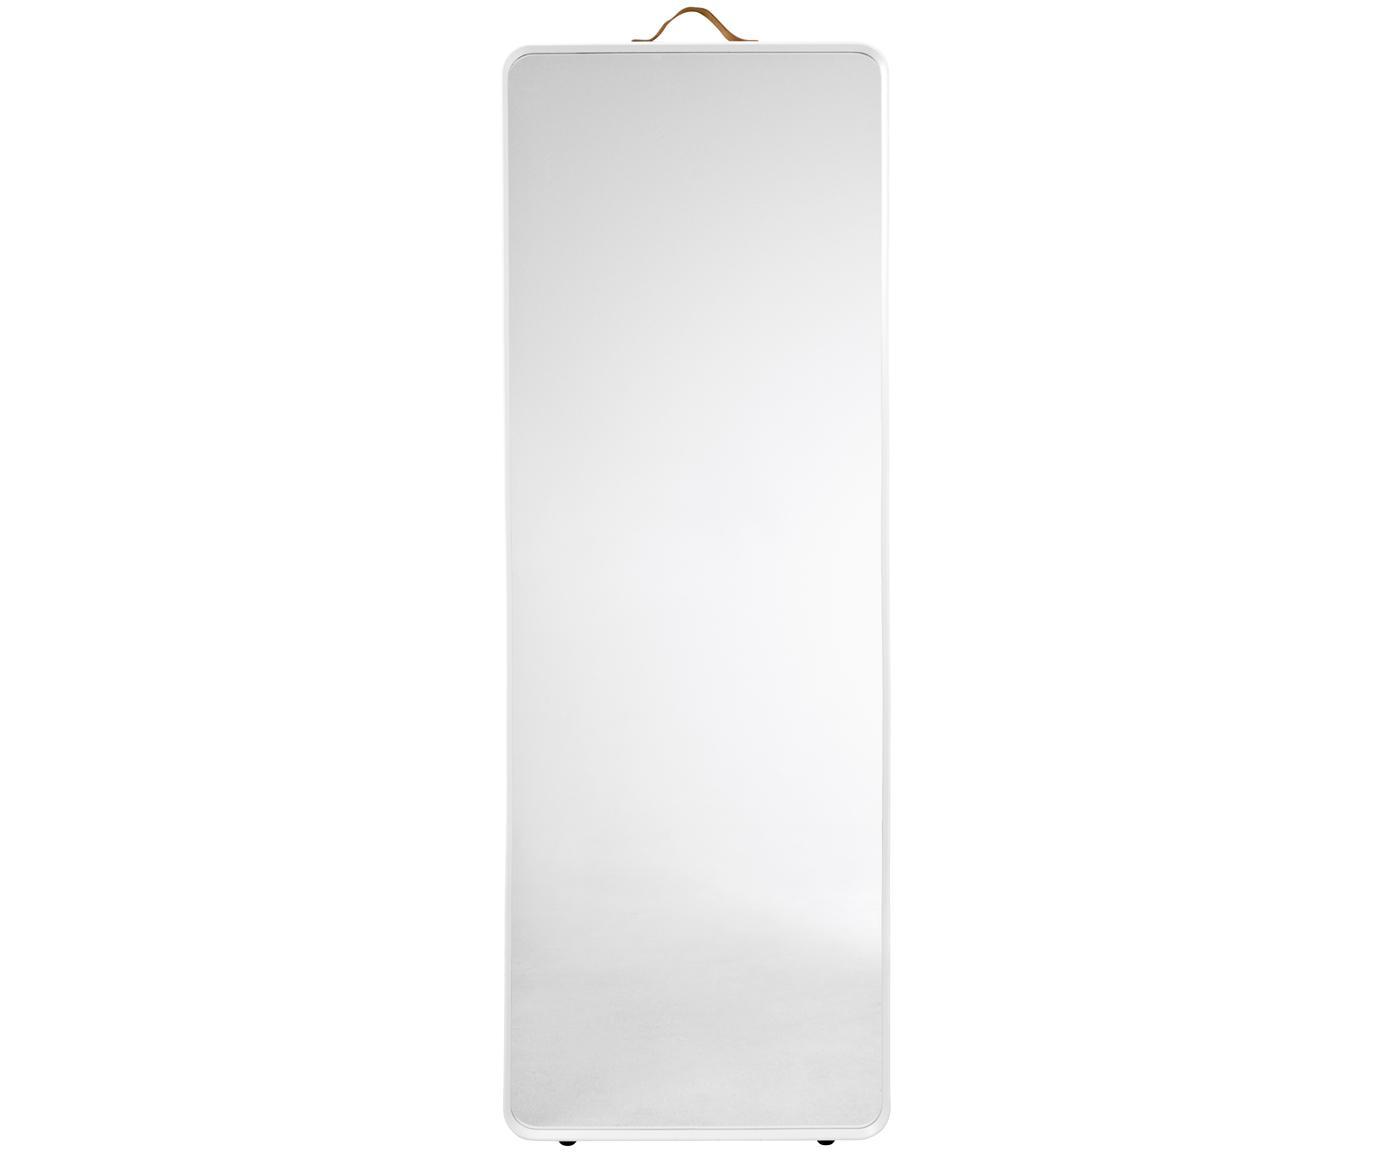 Espejo de pared Norm, Espejo: cristal, Asa: cuero, Blanco, An 60 x Al 170 cm